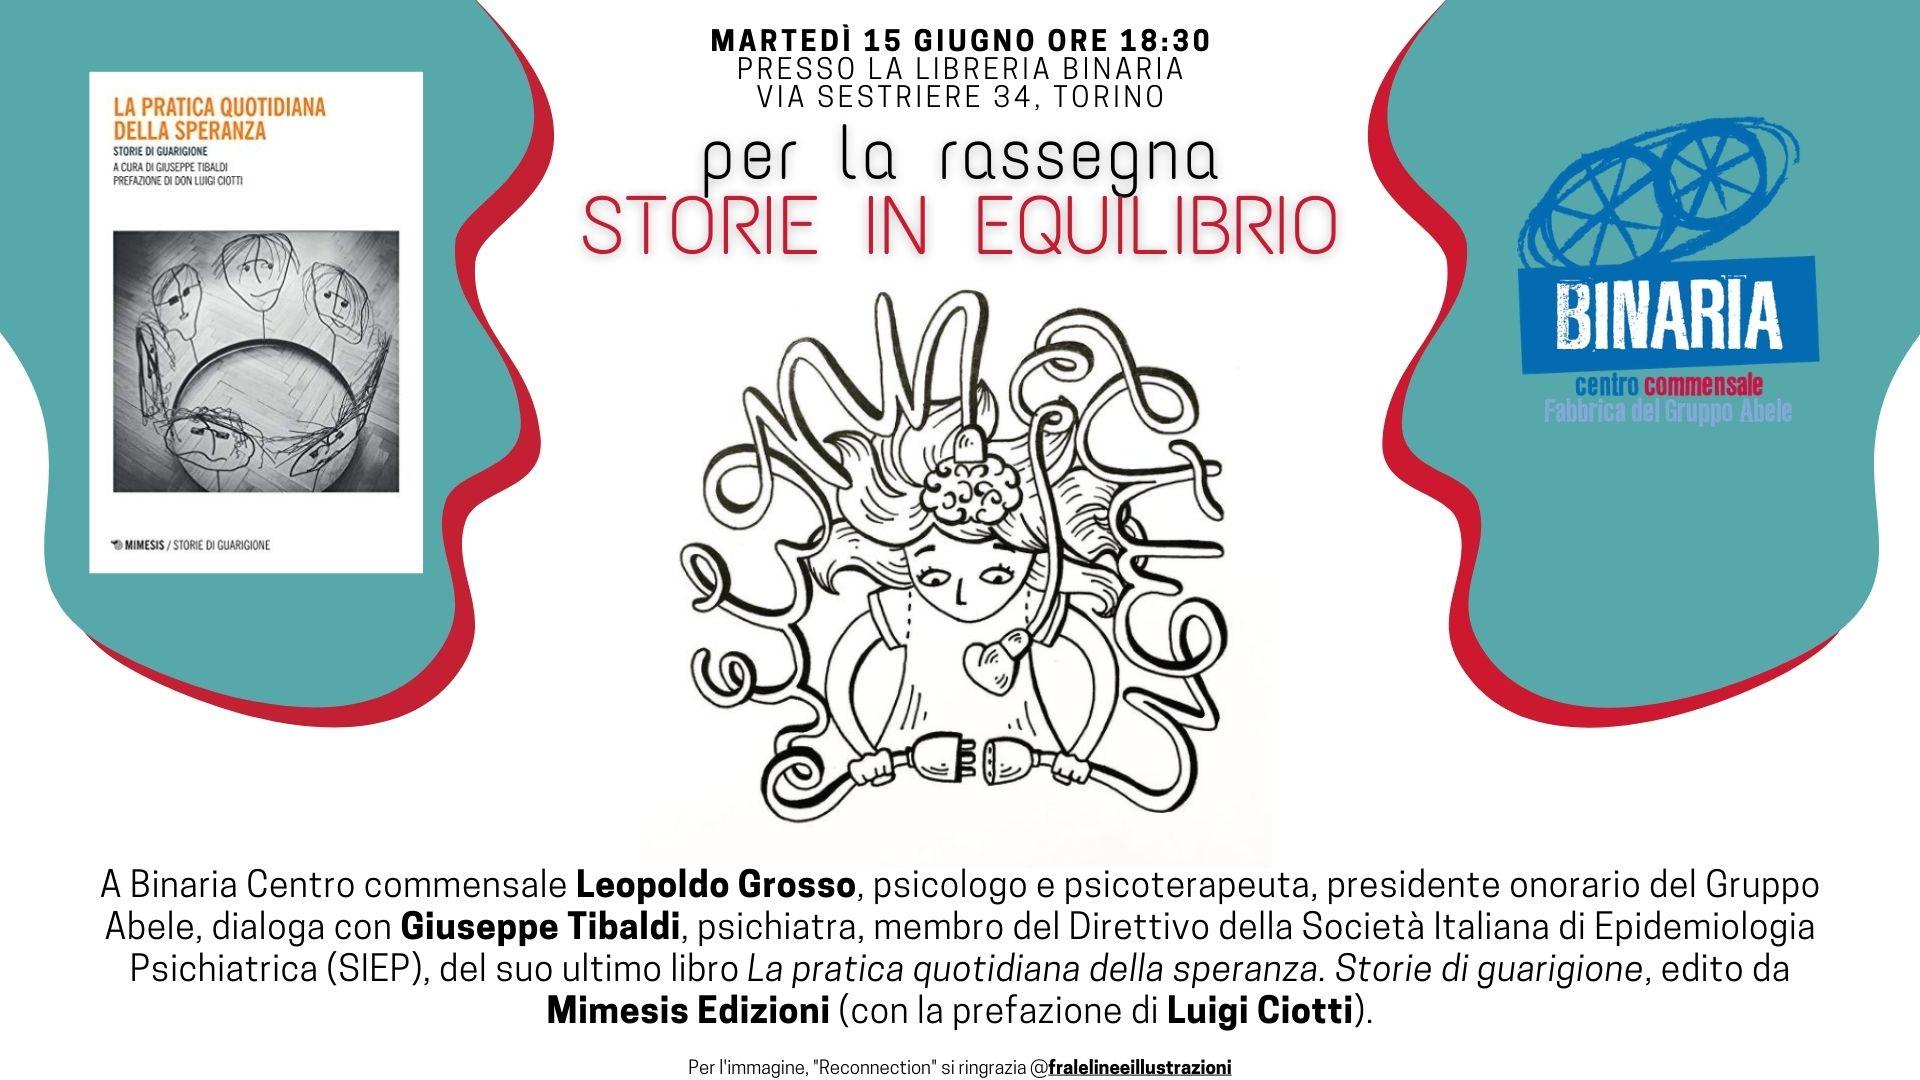 Storie in equilibrio: Tibaldi-Grosso